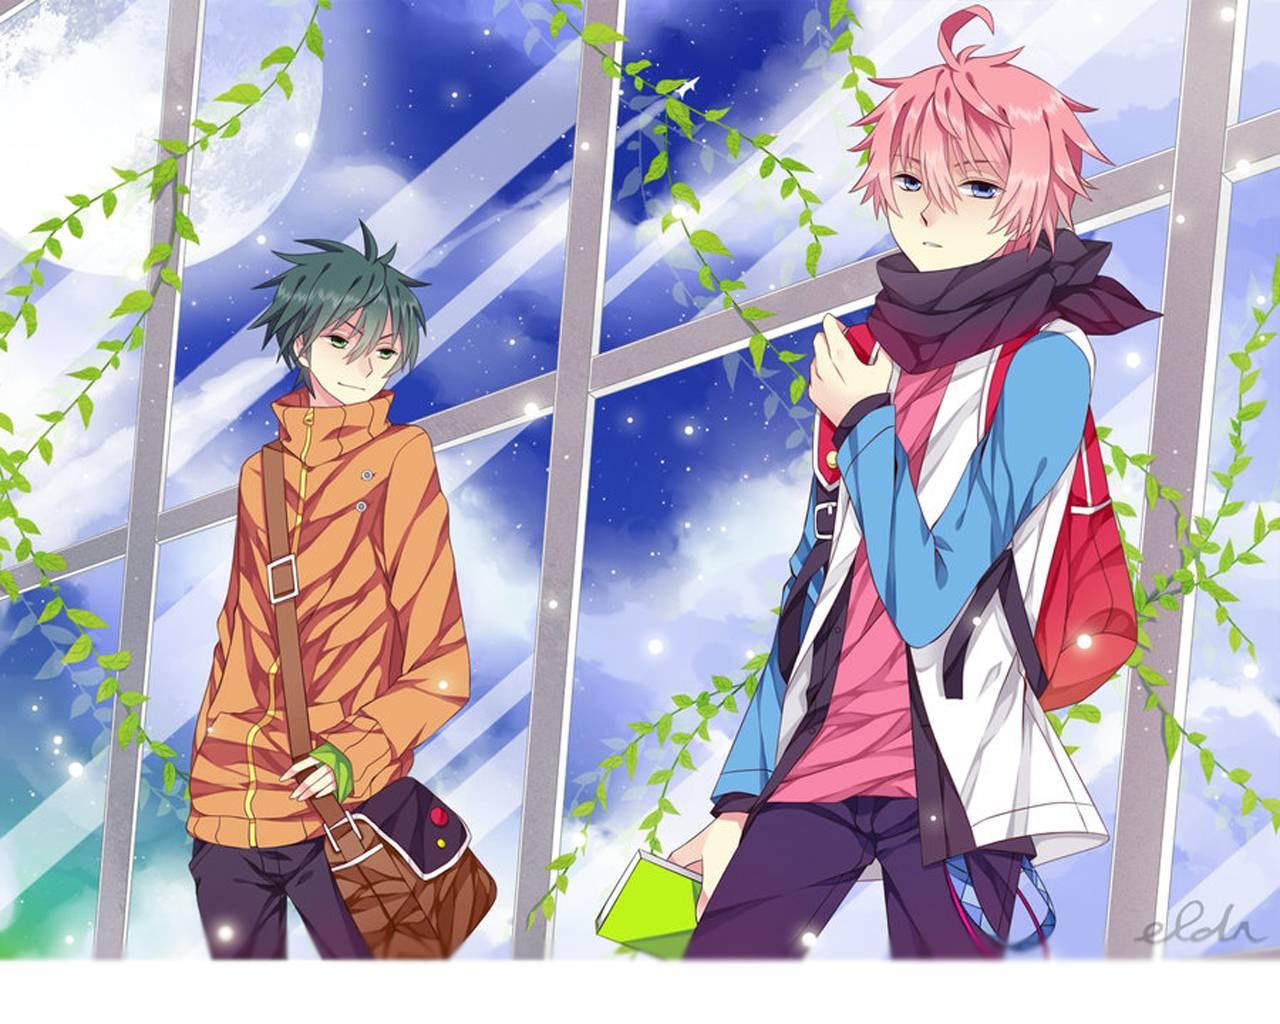 Cute Boys Anime Wallpaper   Anime Manga Wallpaper 1280x1024